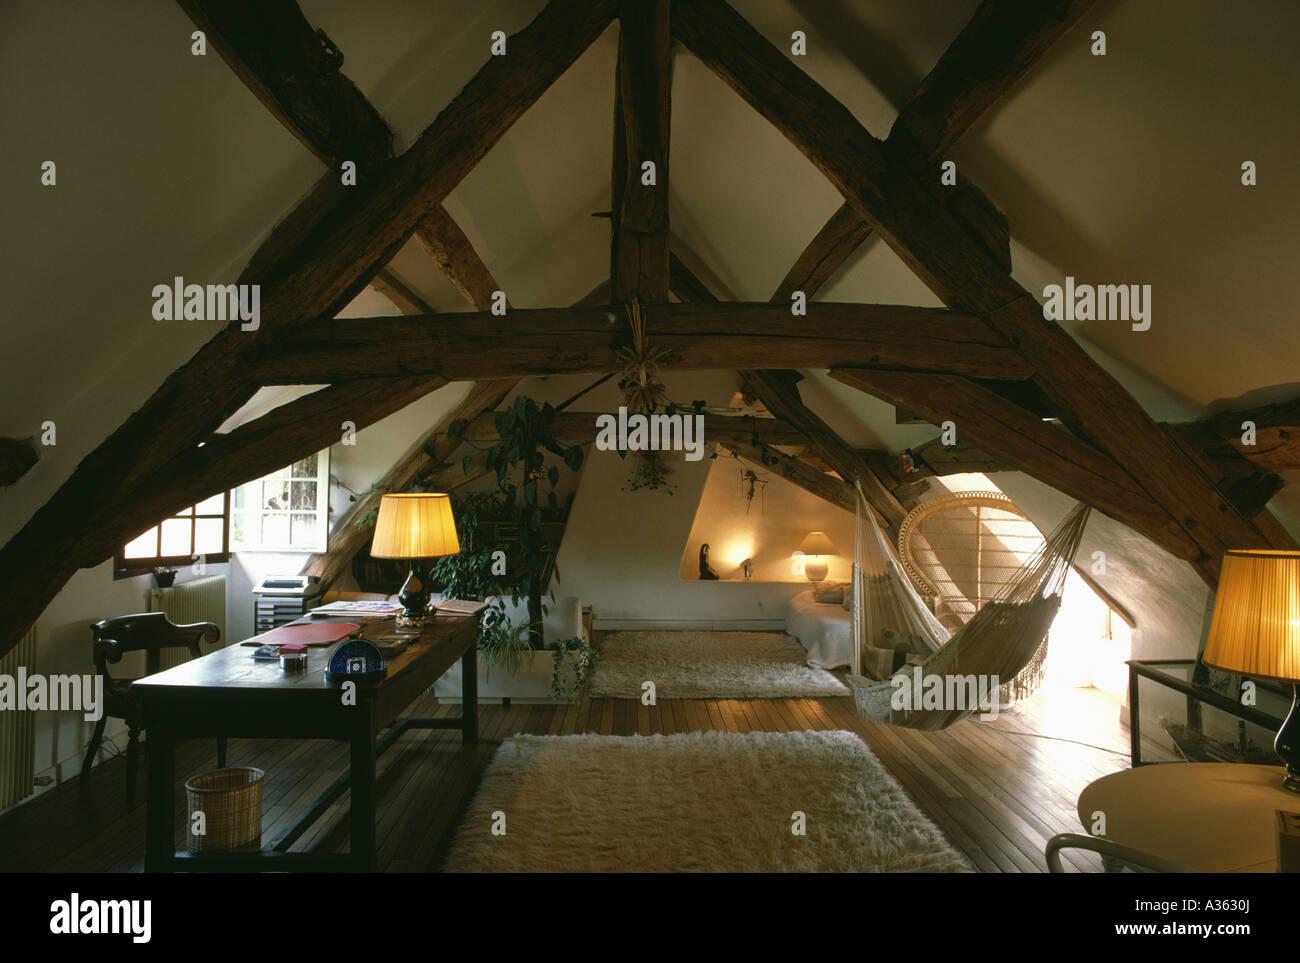 openplan neutral stockfotos openplan neutral bilder alamy. Black Bedroom Furniture Sets. Home Design Ideas